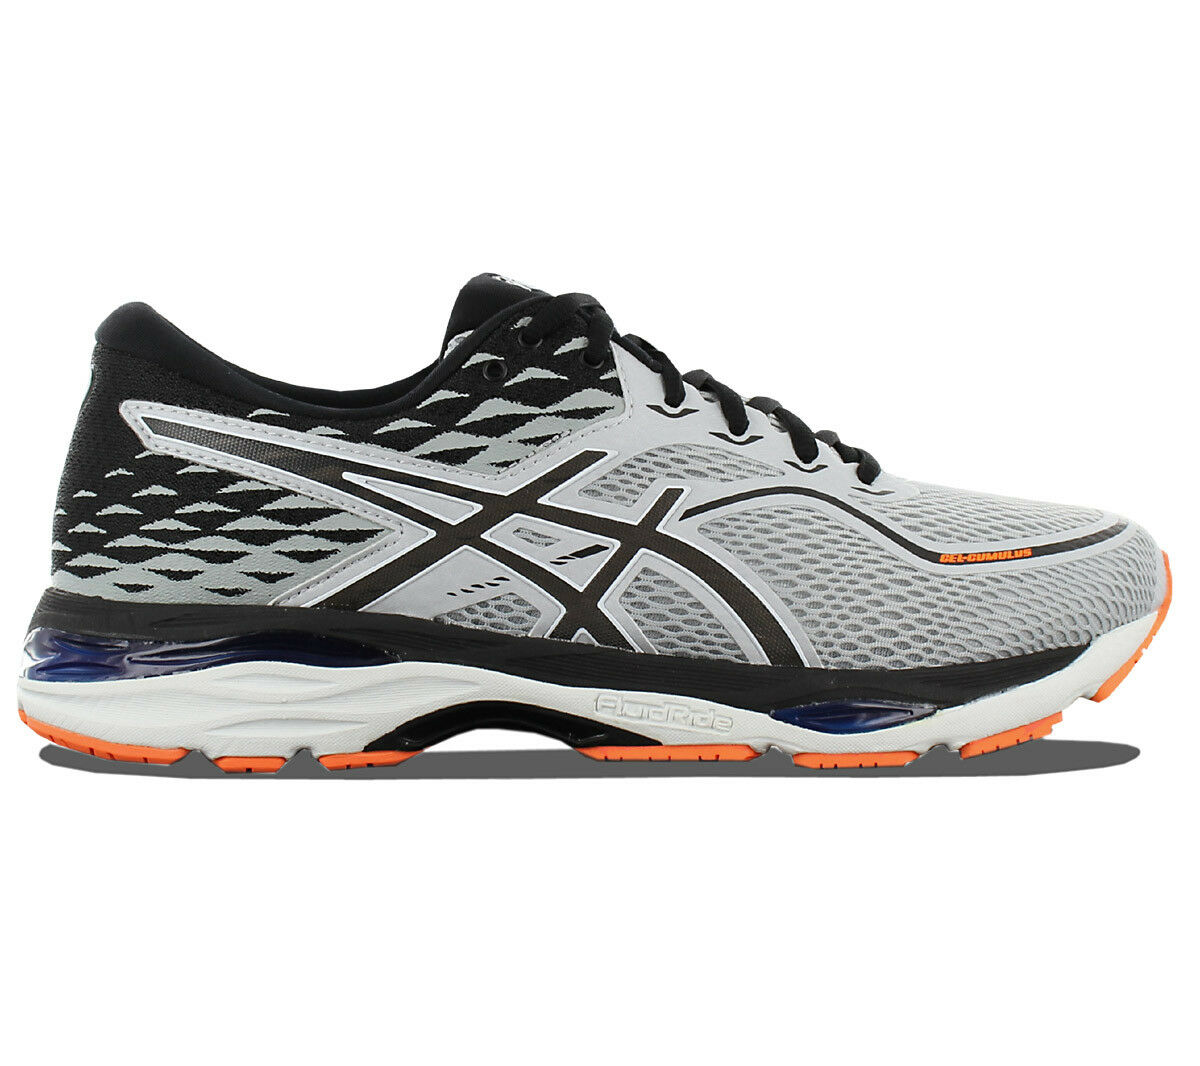 ASICS GelCumulus 19 Uomo Scarpe Da Corsa Running Sport Scarpe Fitness t7b3n9601